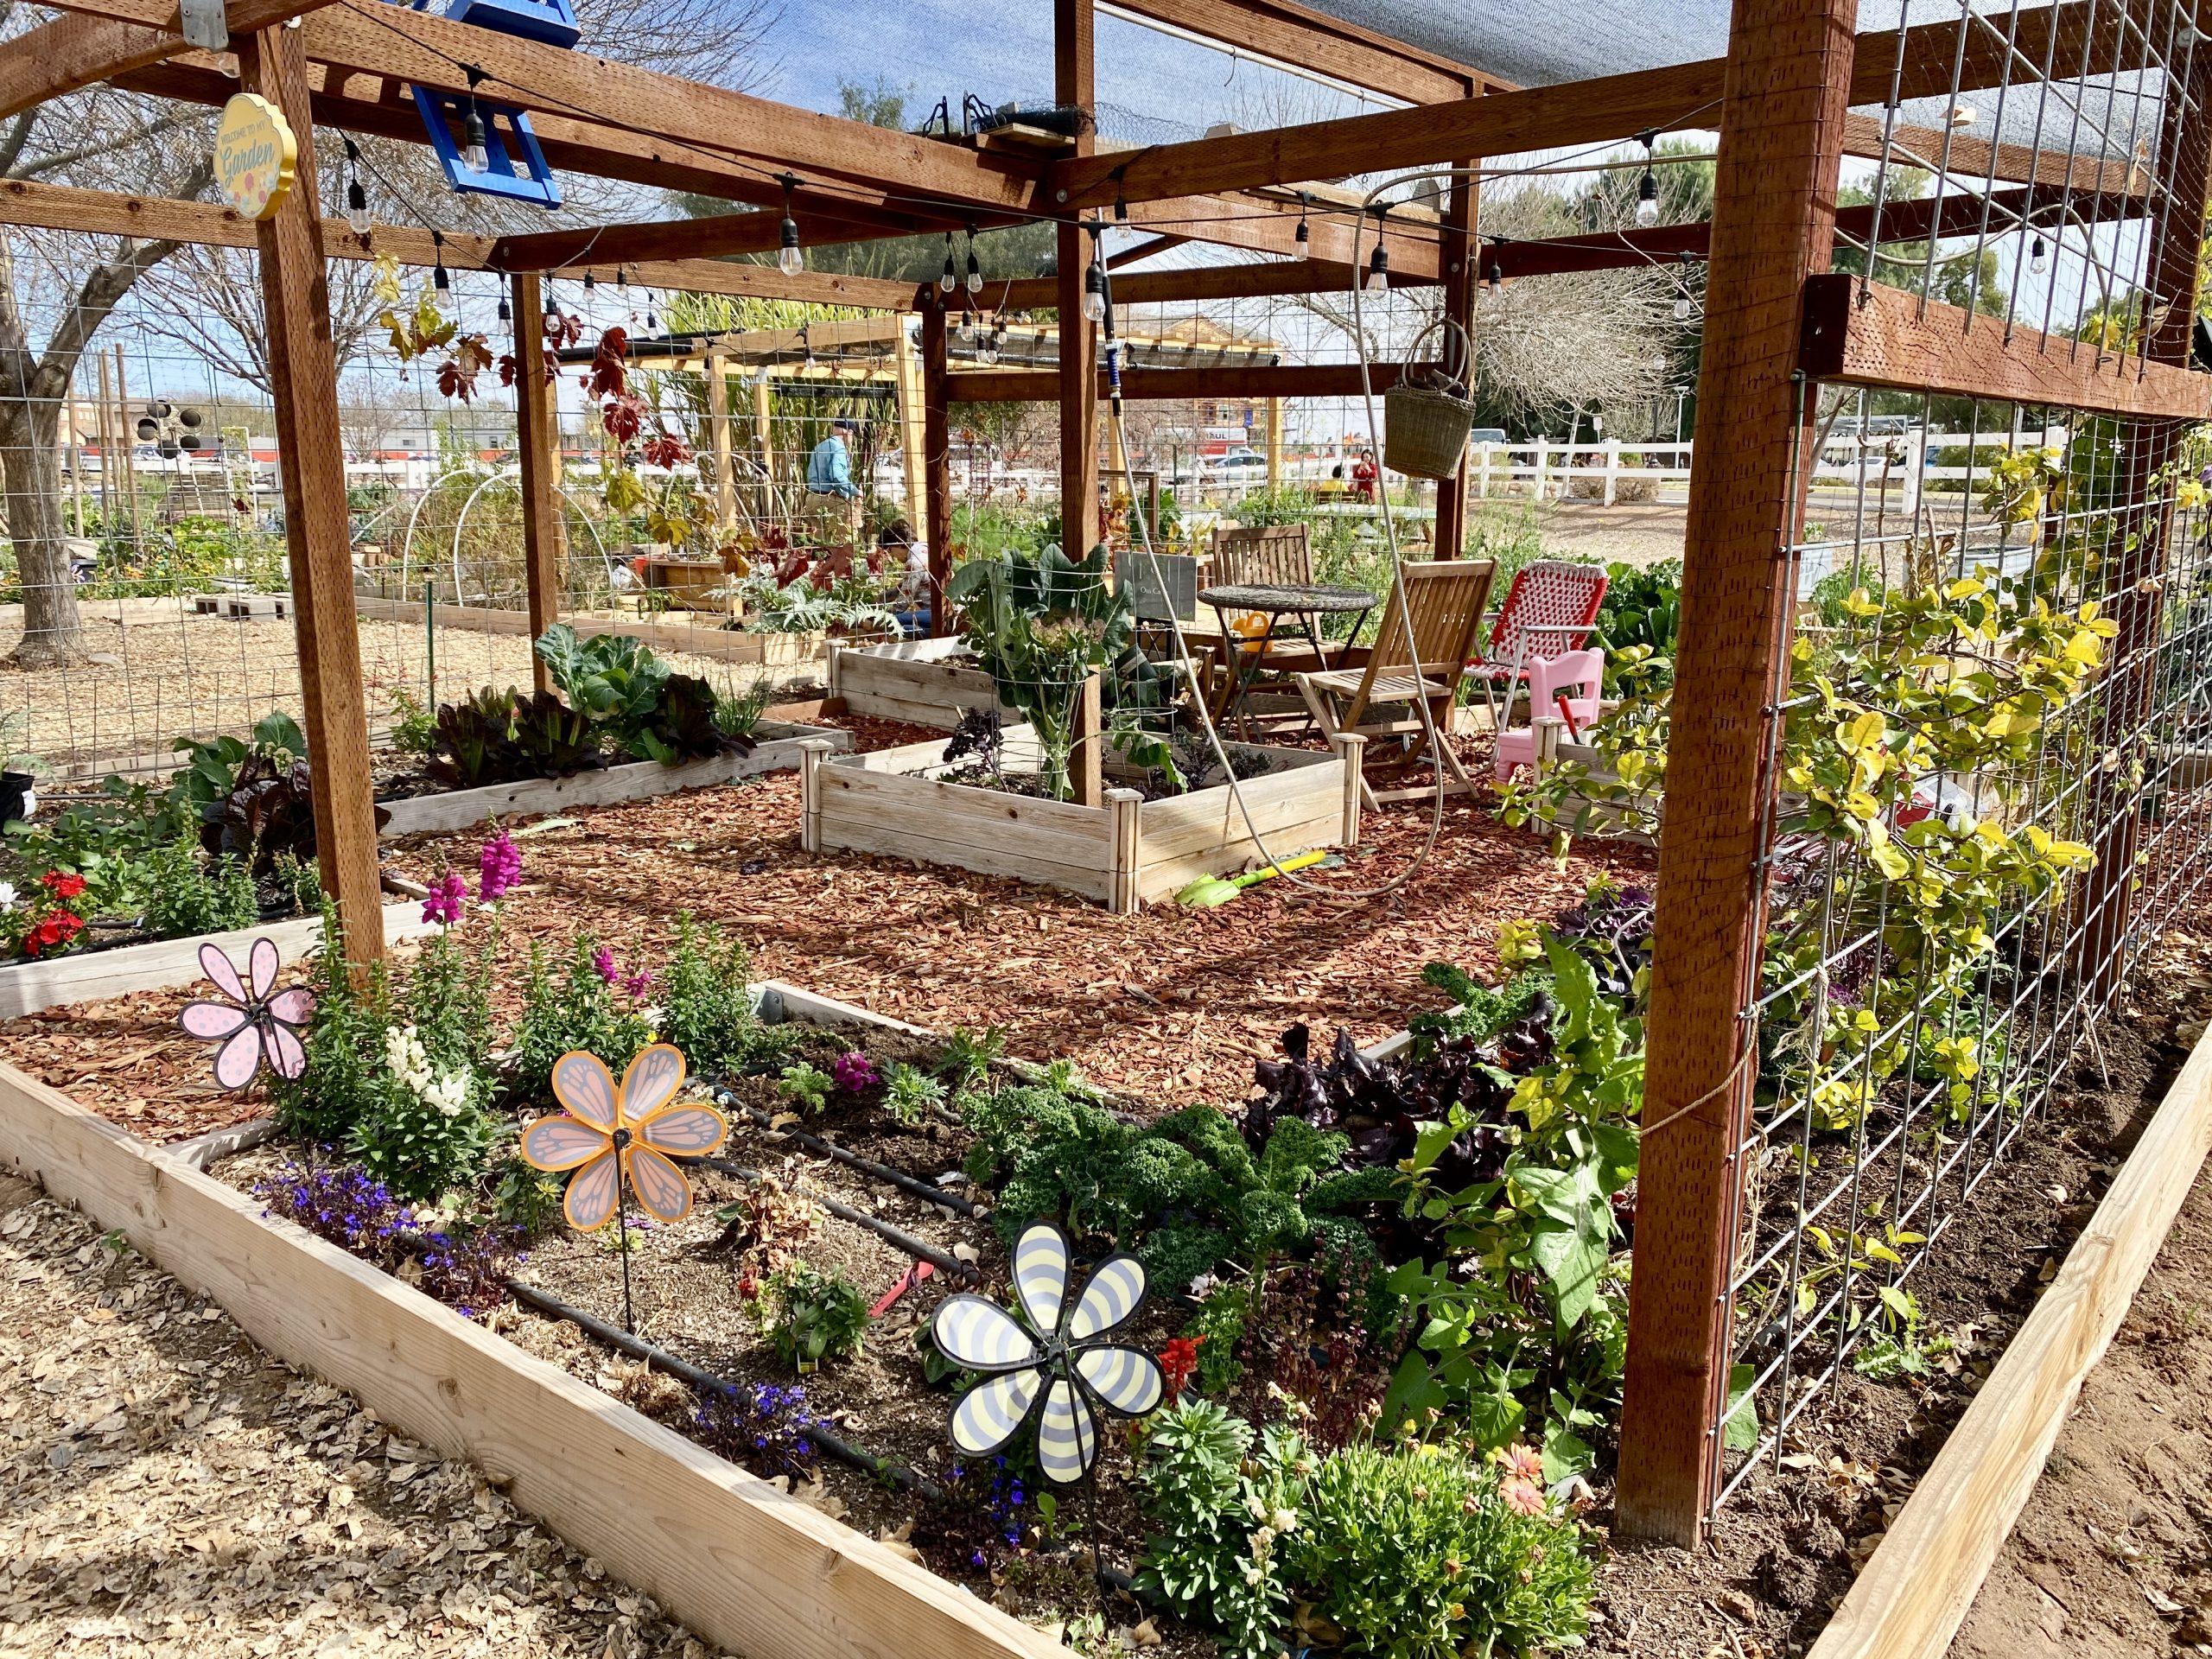 Modern farming at historic Agritopia in Gilbert, Arizona